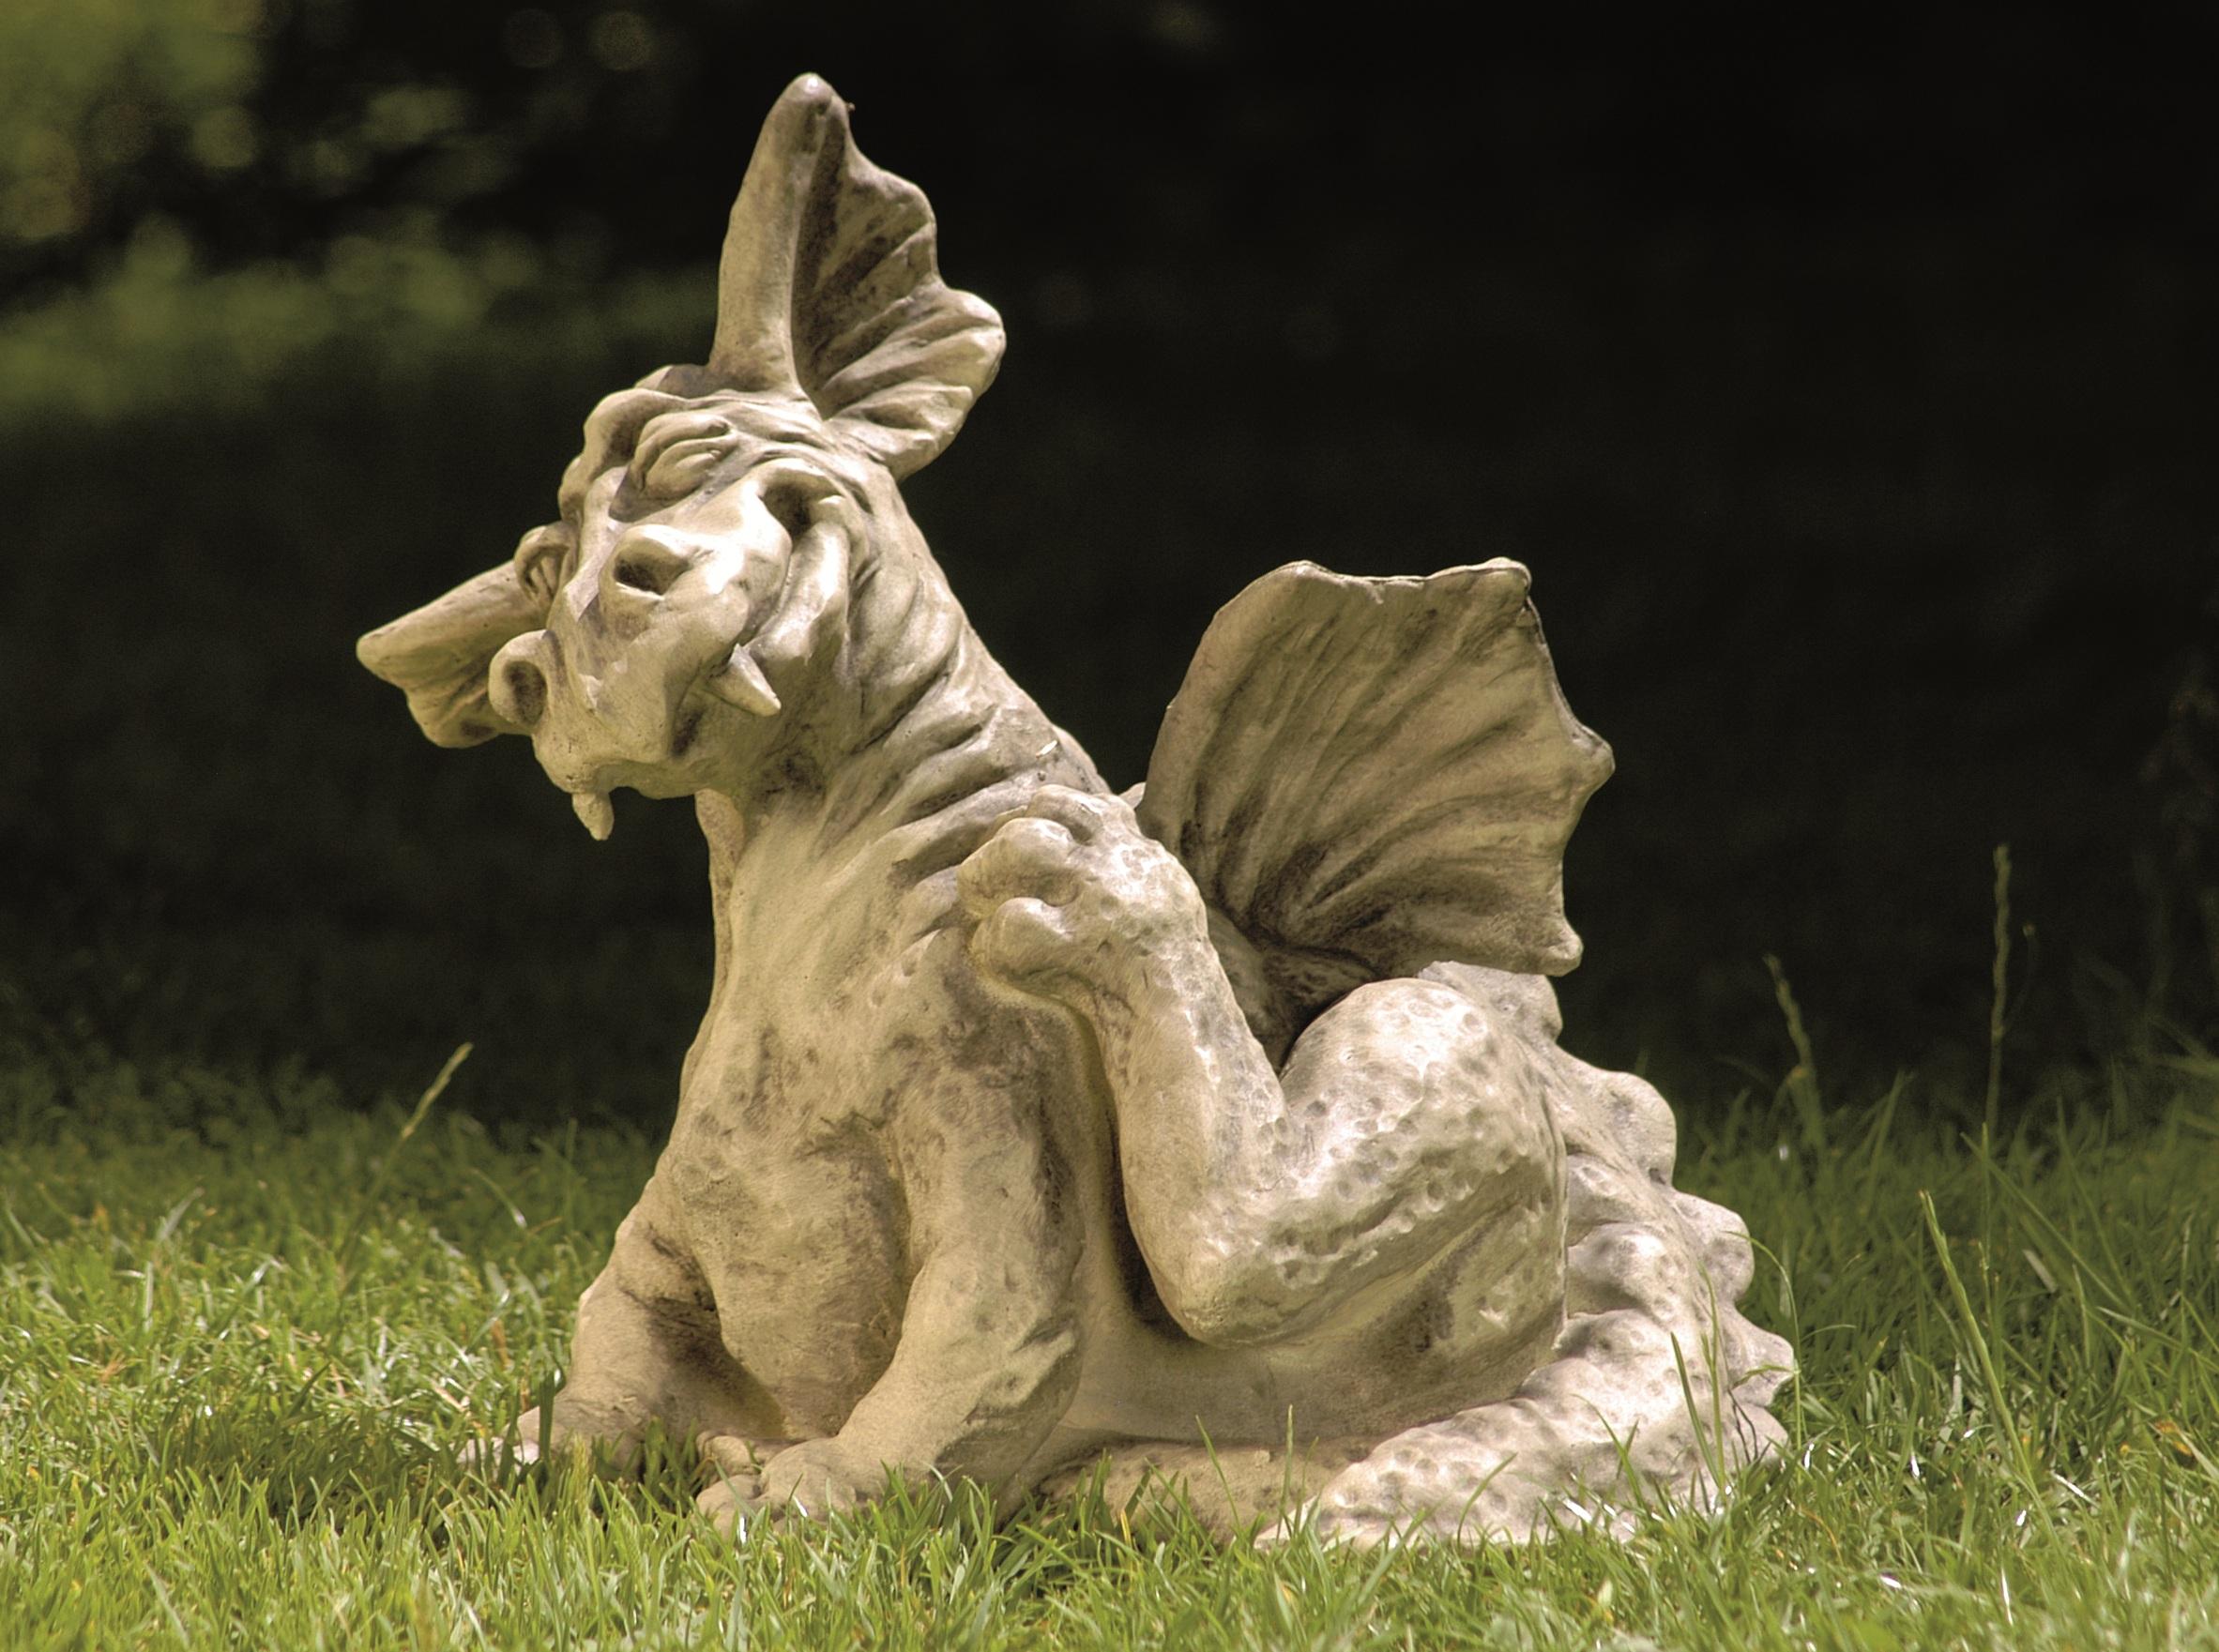 drache scratch gartendeko steinfigur devonshire, Garten ideen